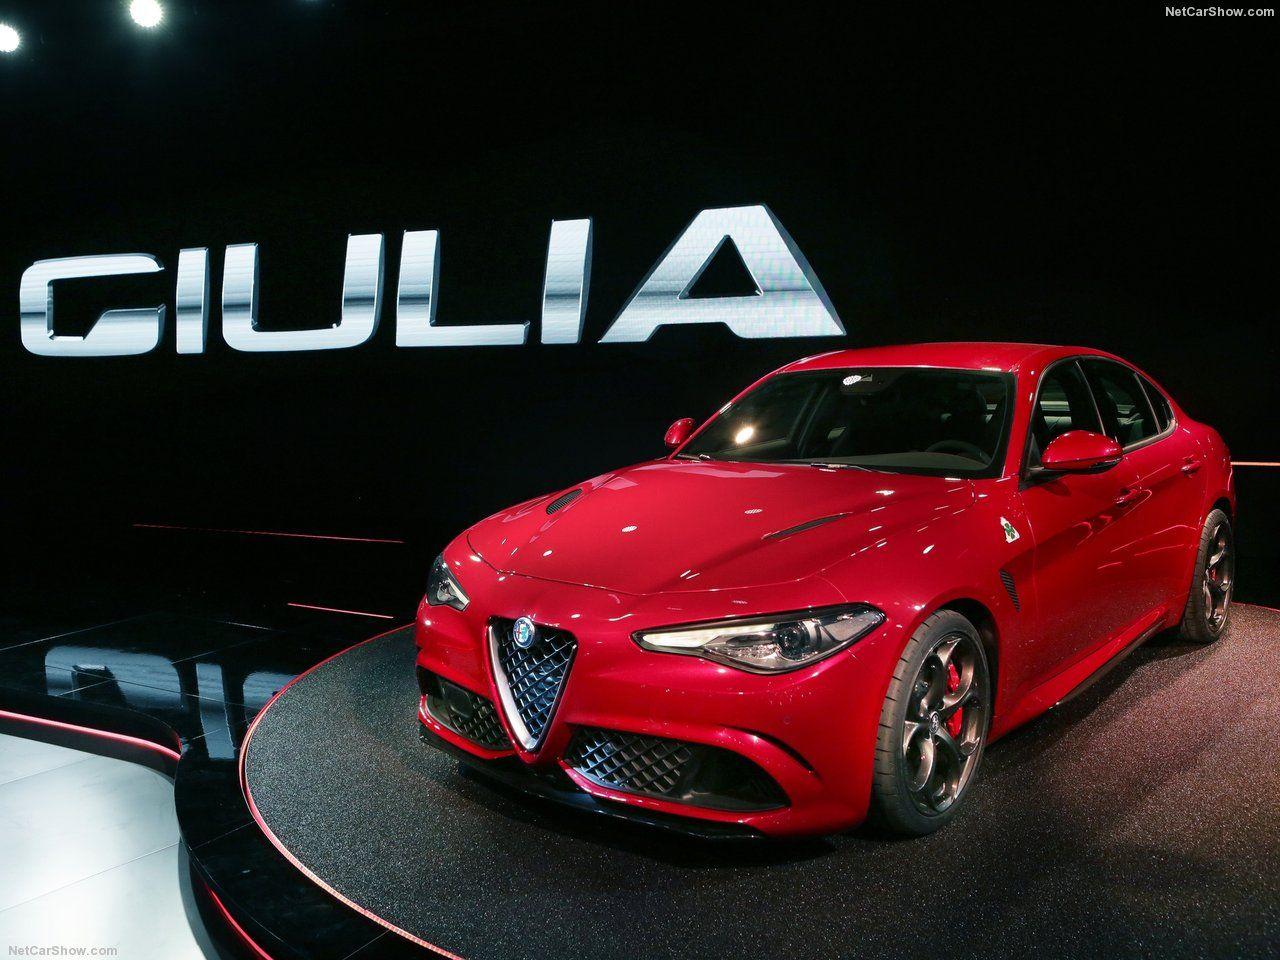 The New Giulia This Is An Alfa Alfa Romeo Giulia Alfa Romeo Giulia Quadrifoglio Alfa Romeo